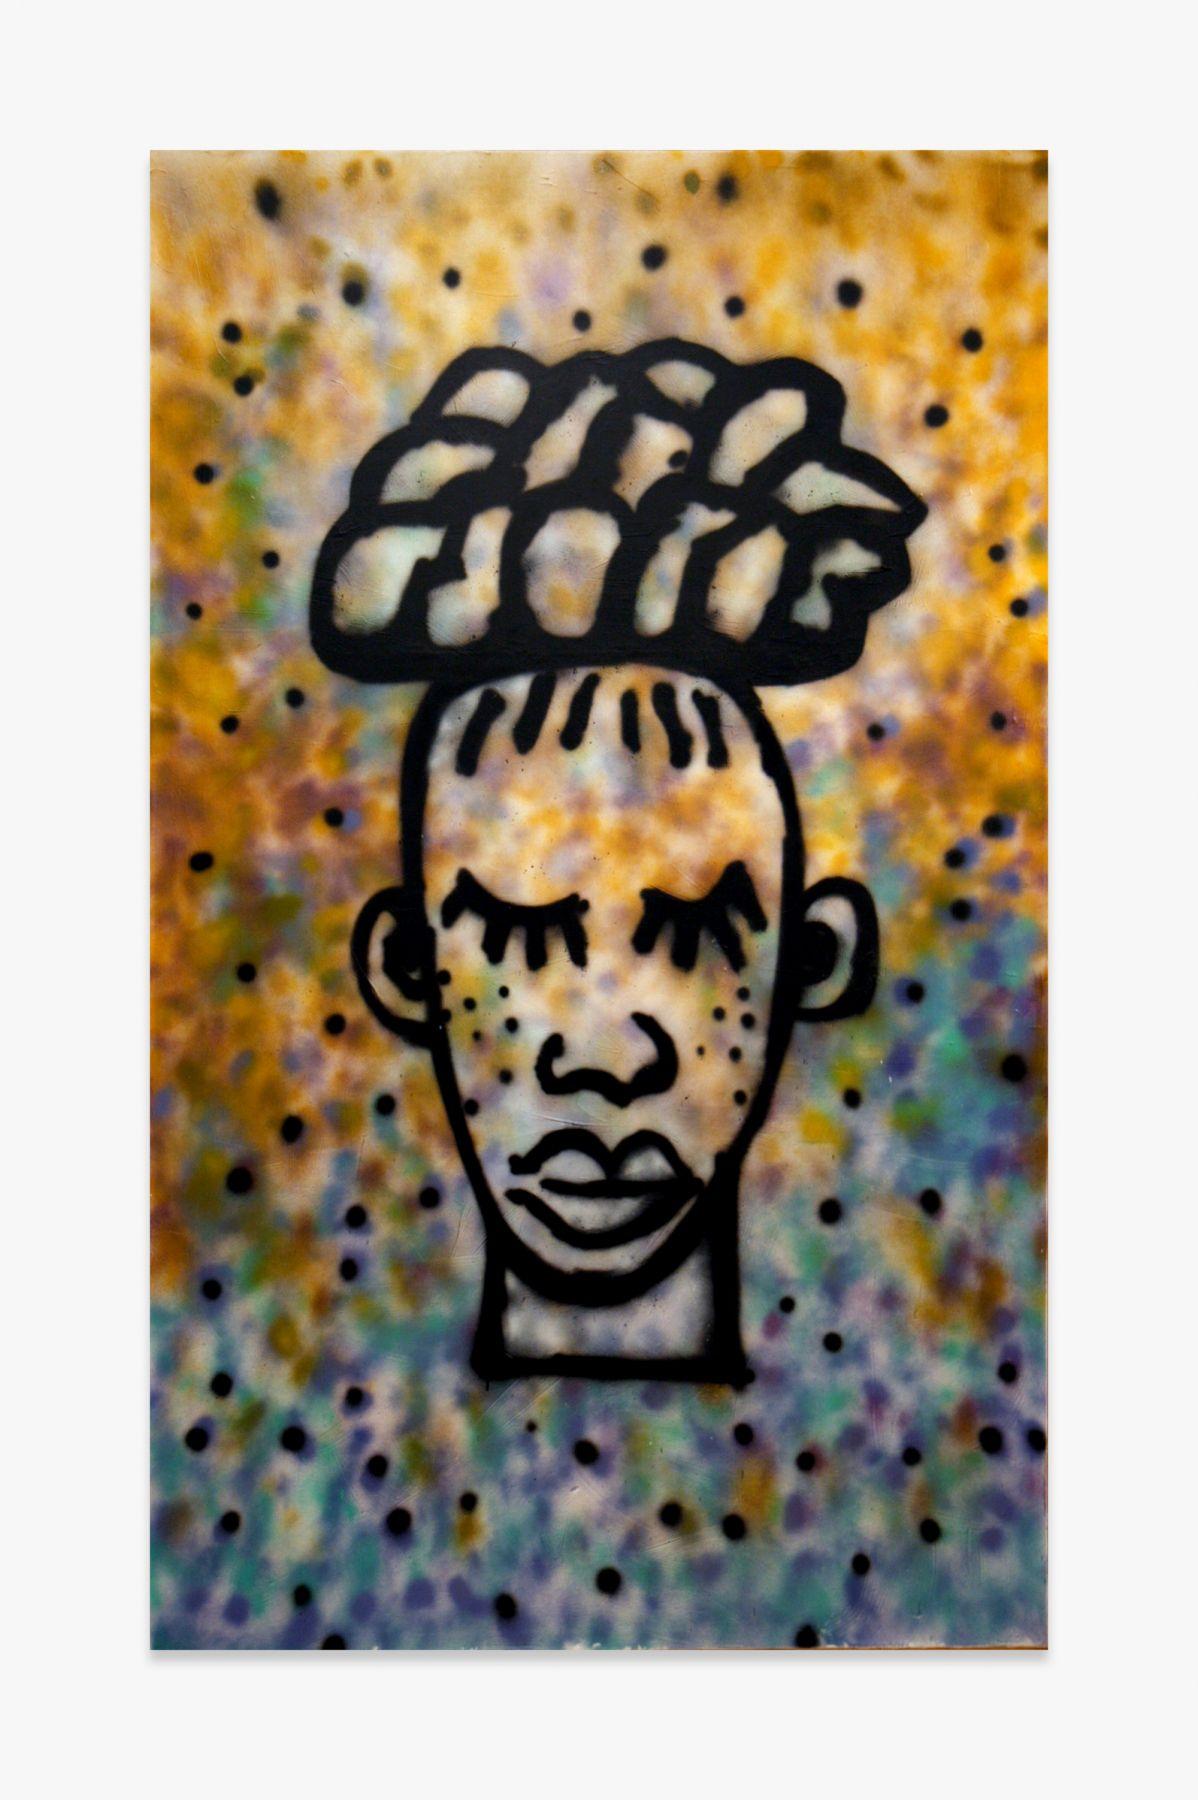 Walter Dahn Soul Beuys